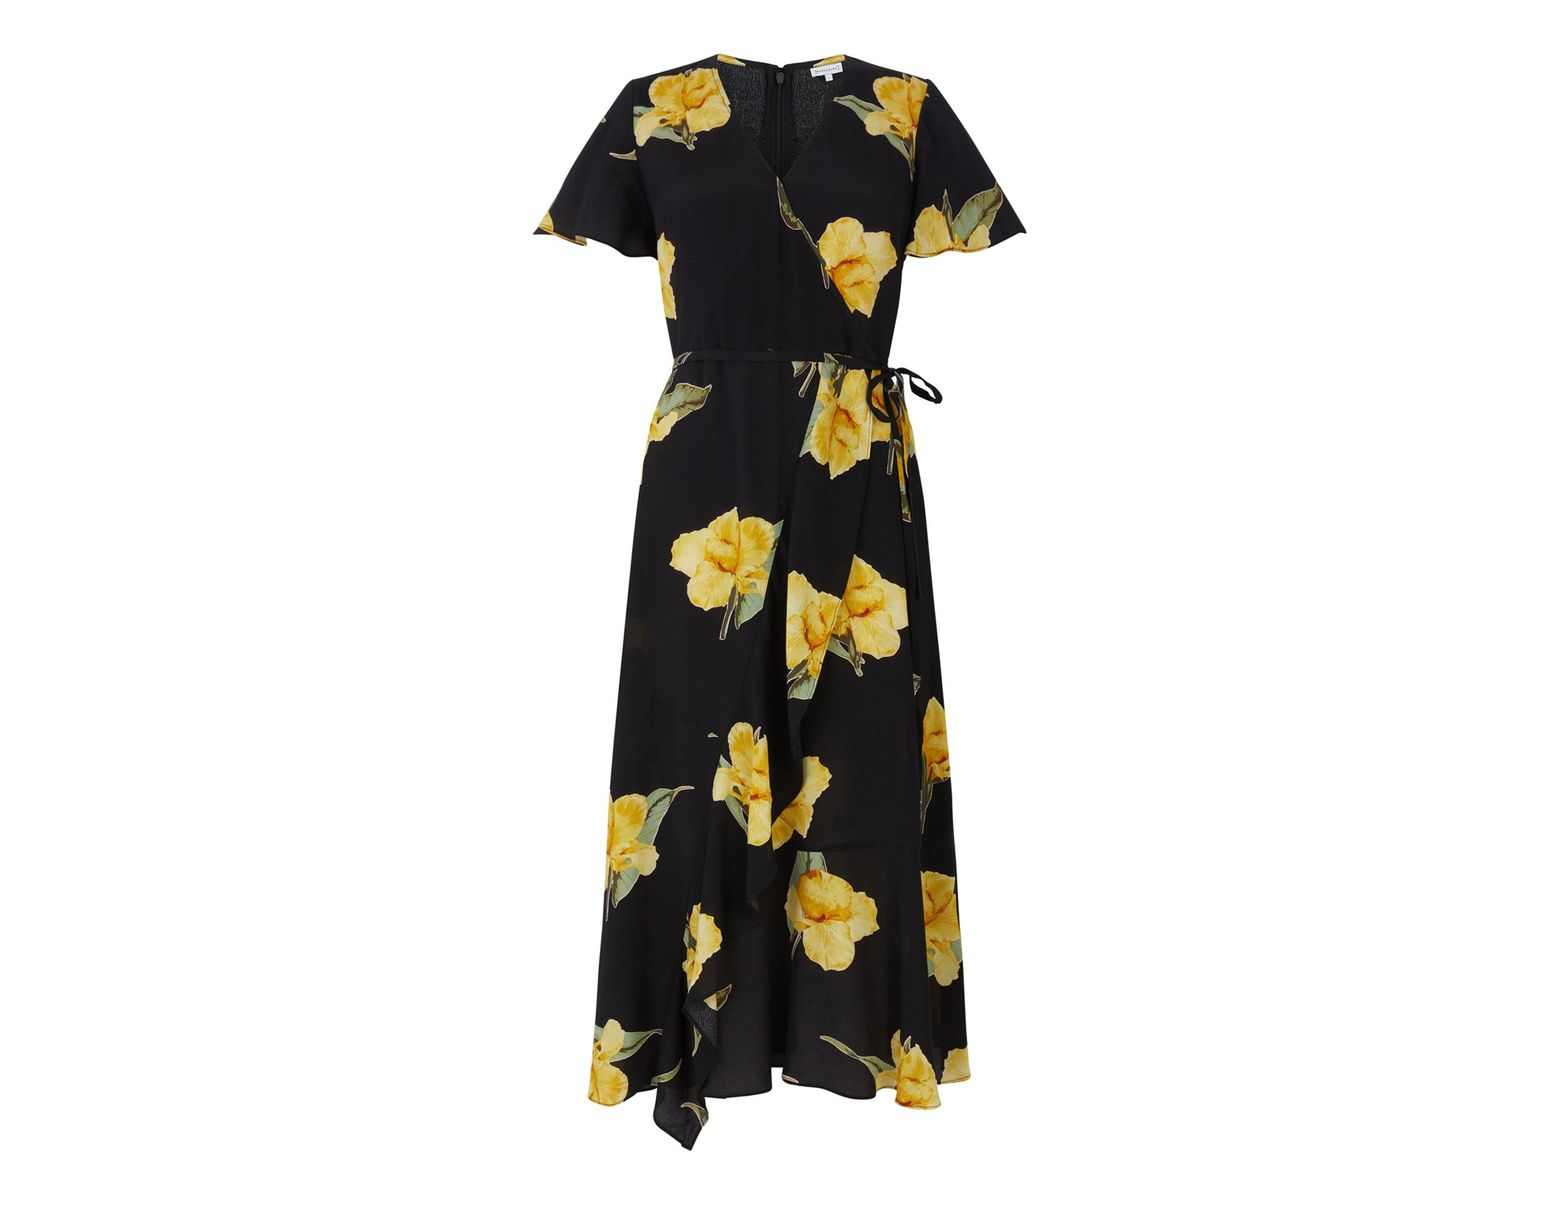 5aa2ba82ca5e Warehouse Yellow Floral Midi Wrap Dress in Black - Lyst